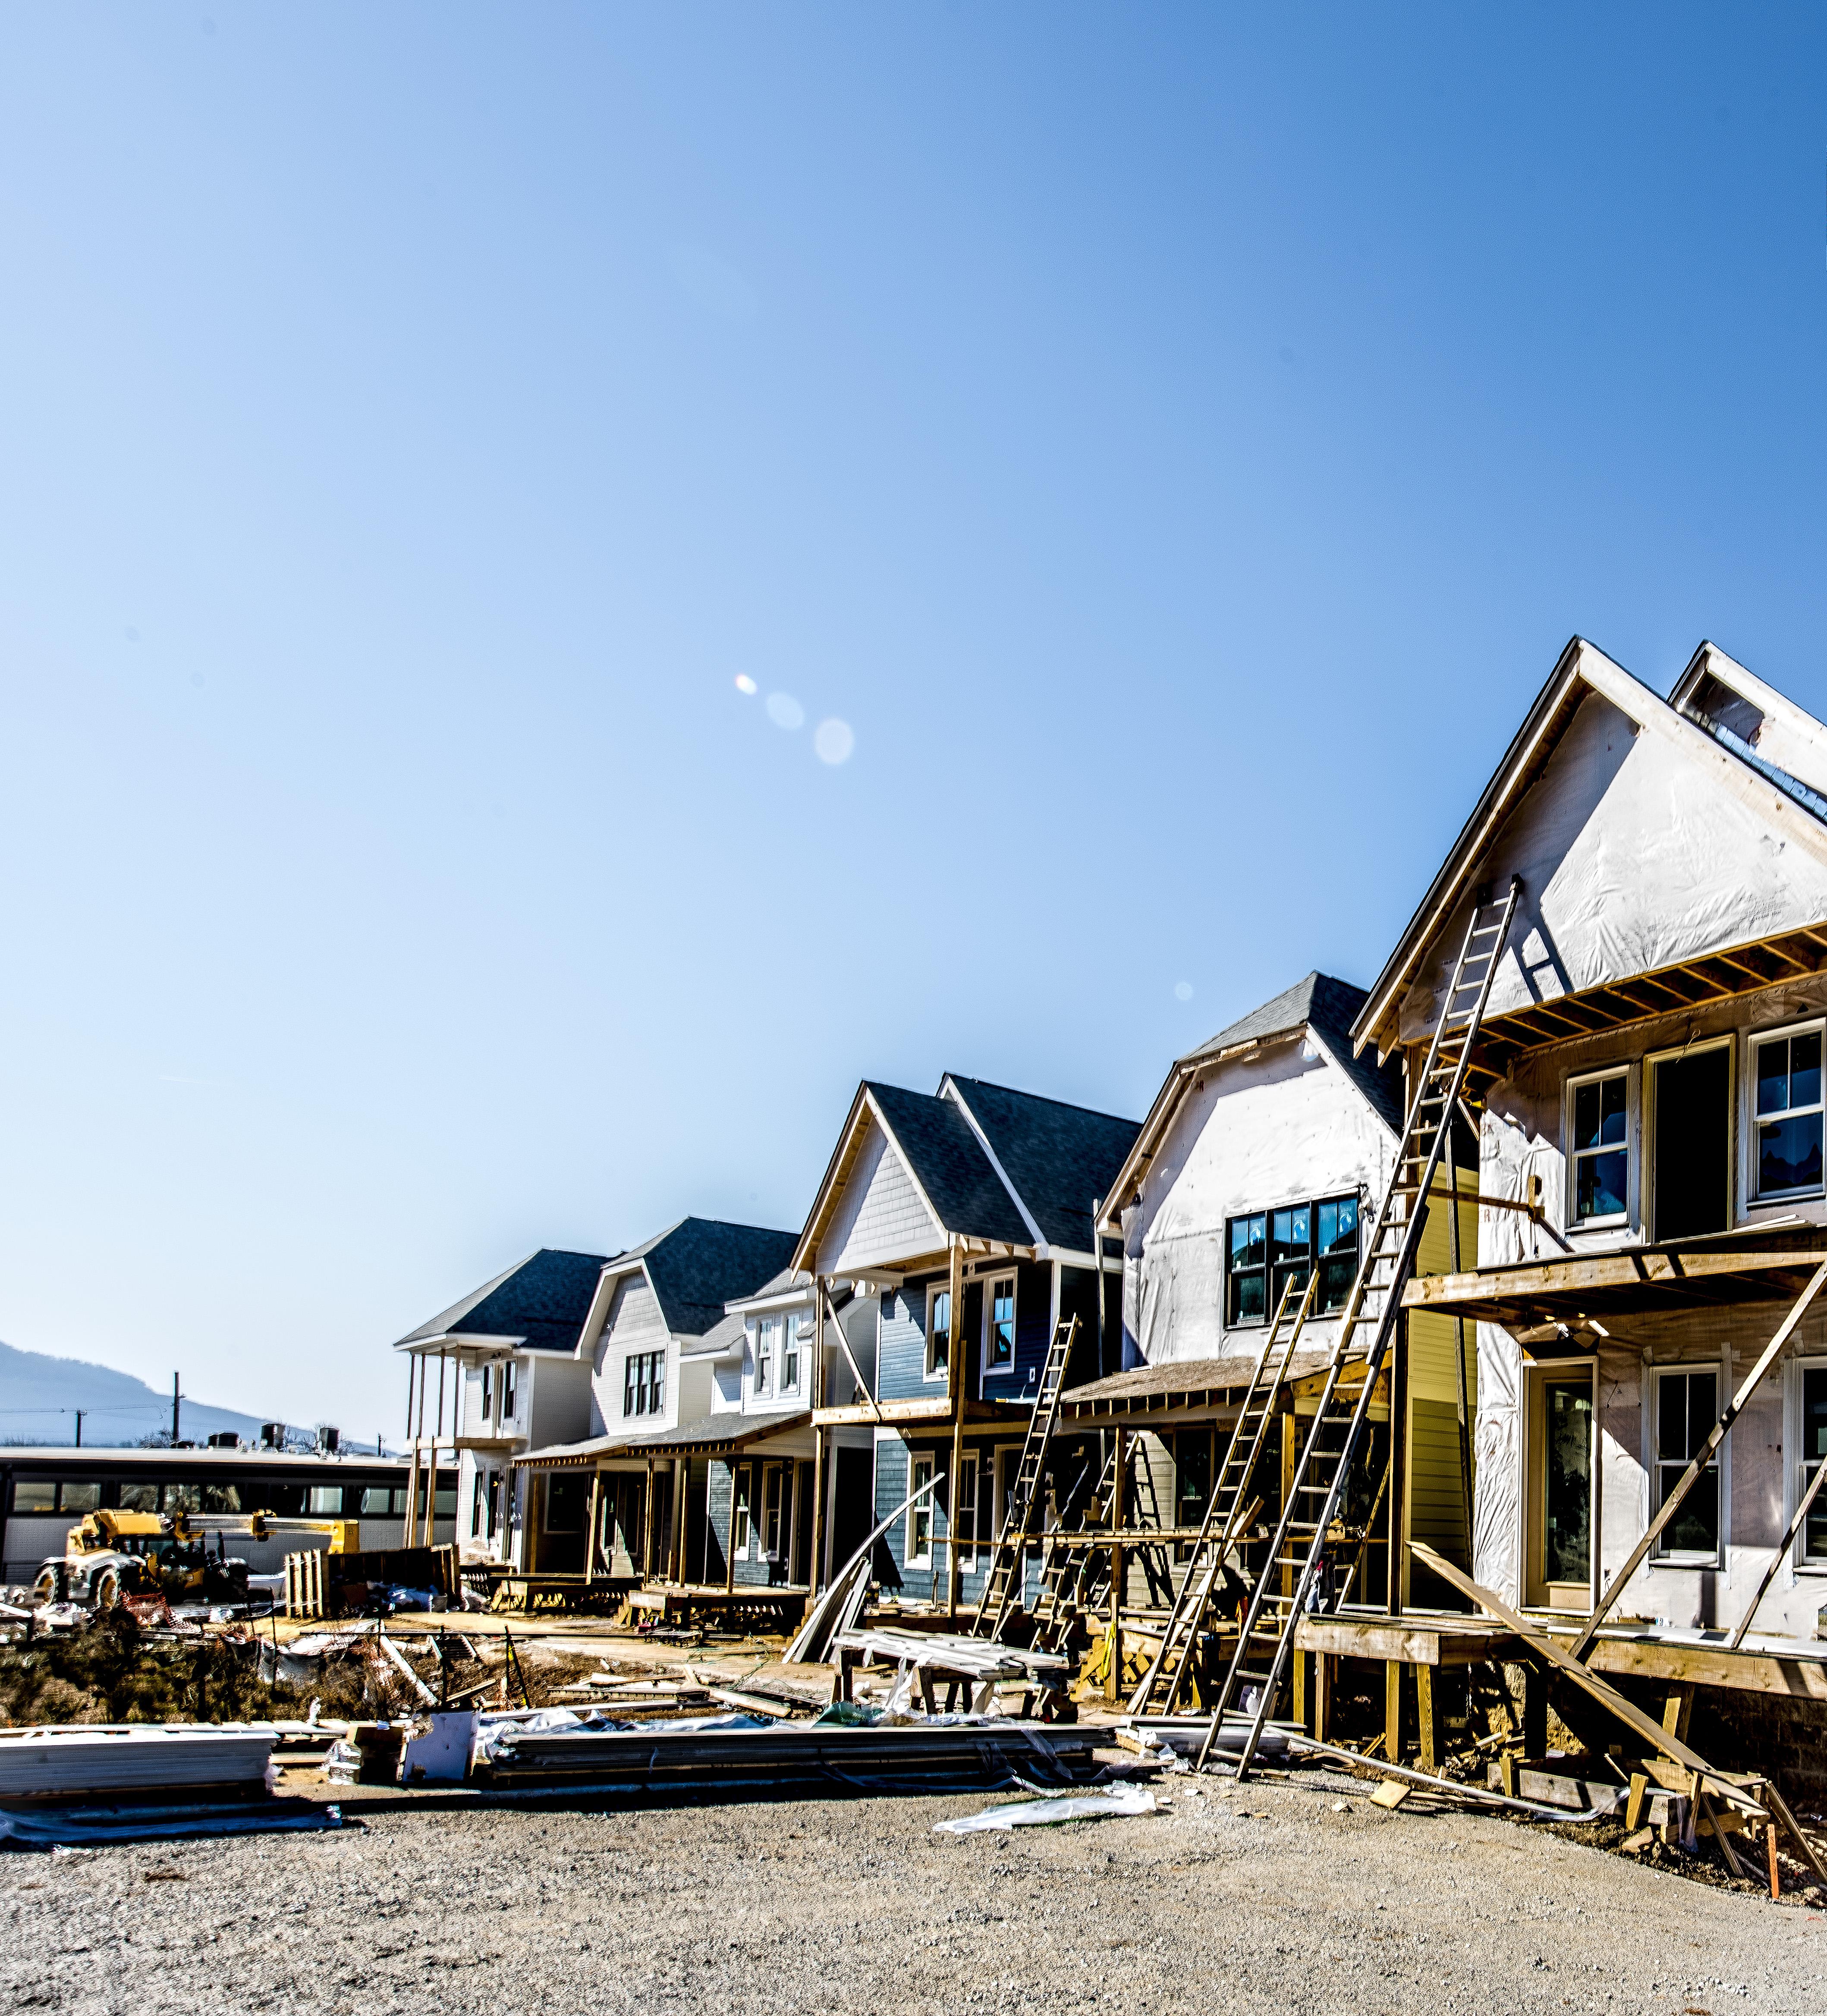 Hispanic homebuyers are the future of the U.S. housing market